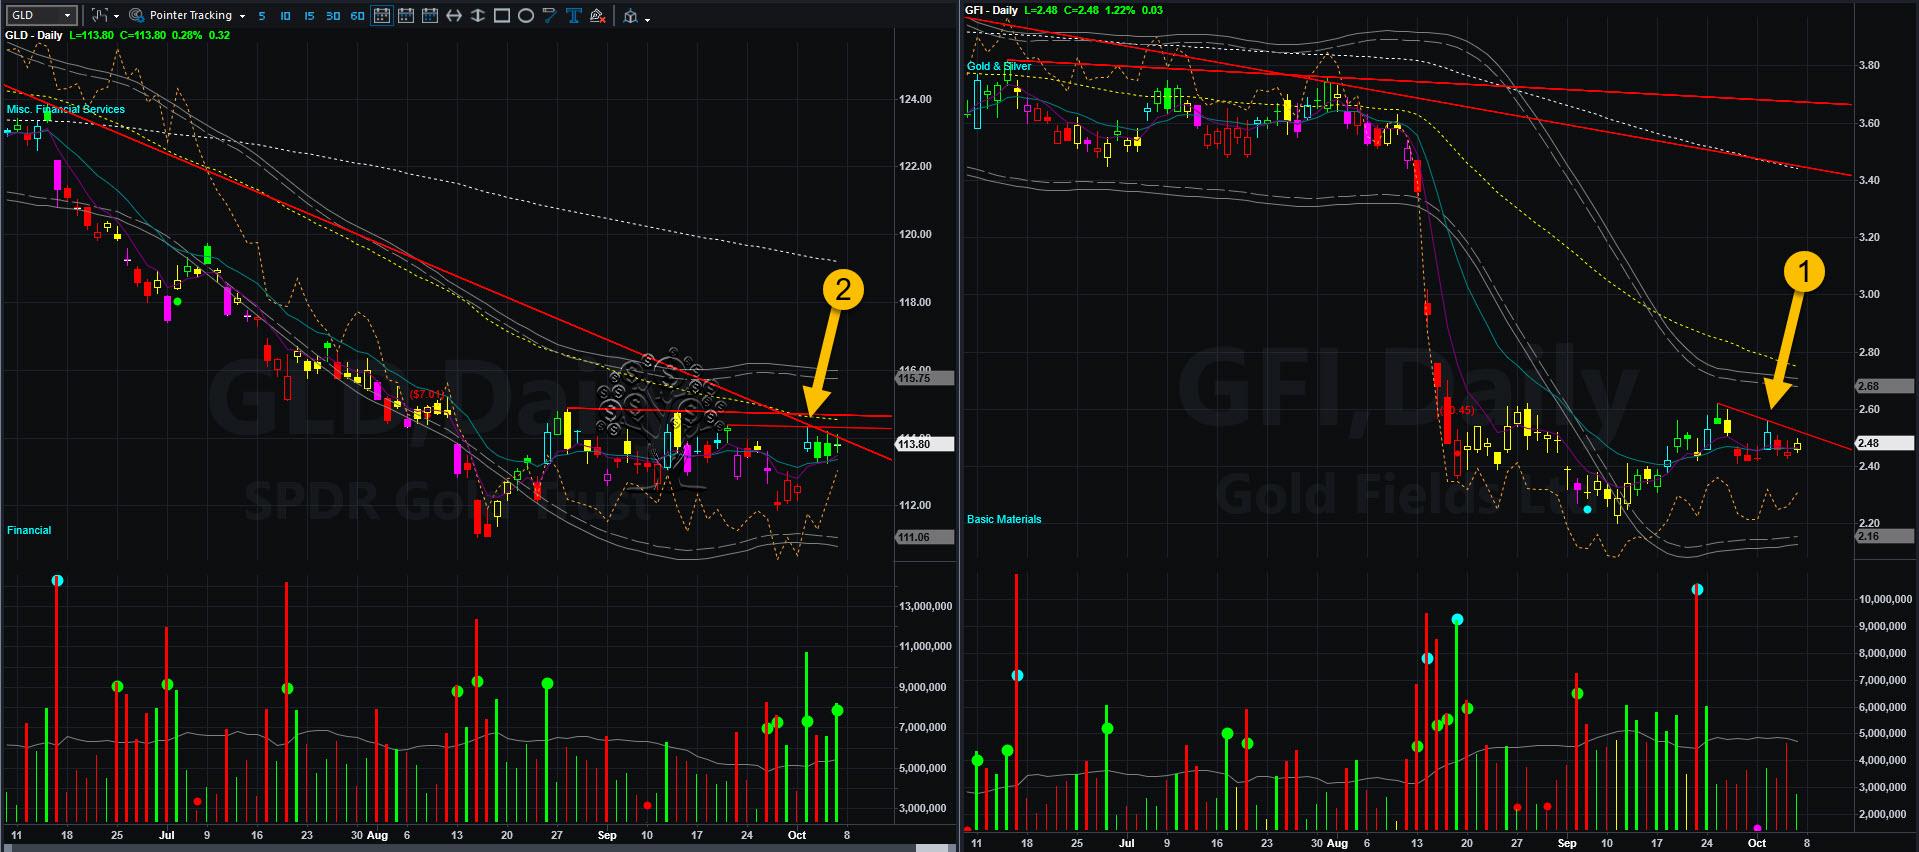 gfi chart 2018-10-06_0-12-37.jpg